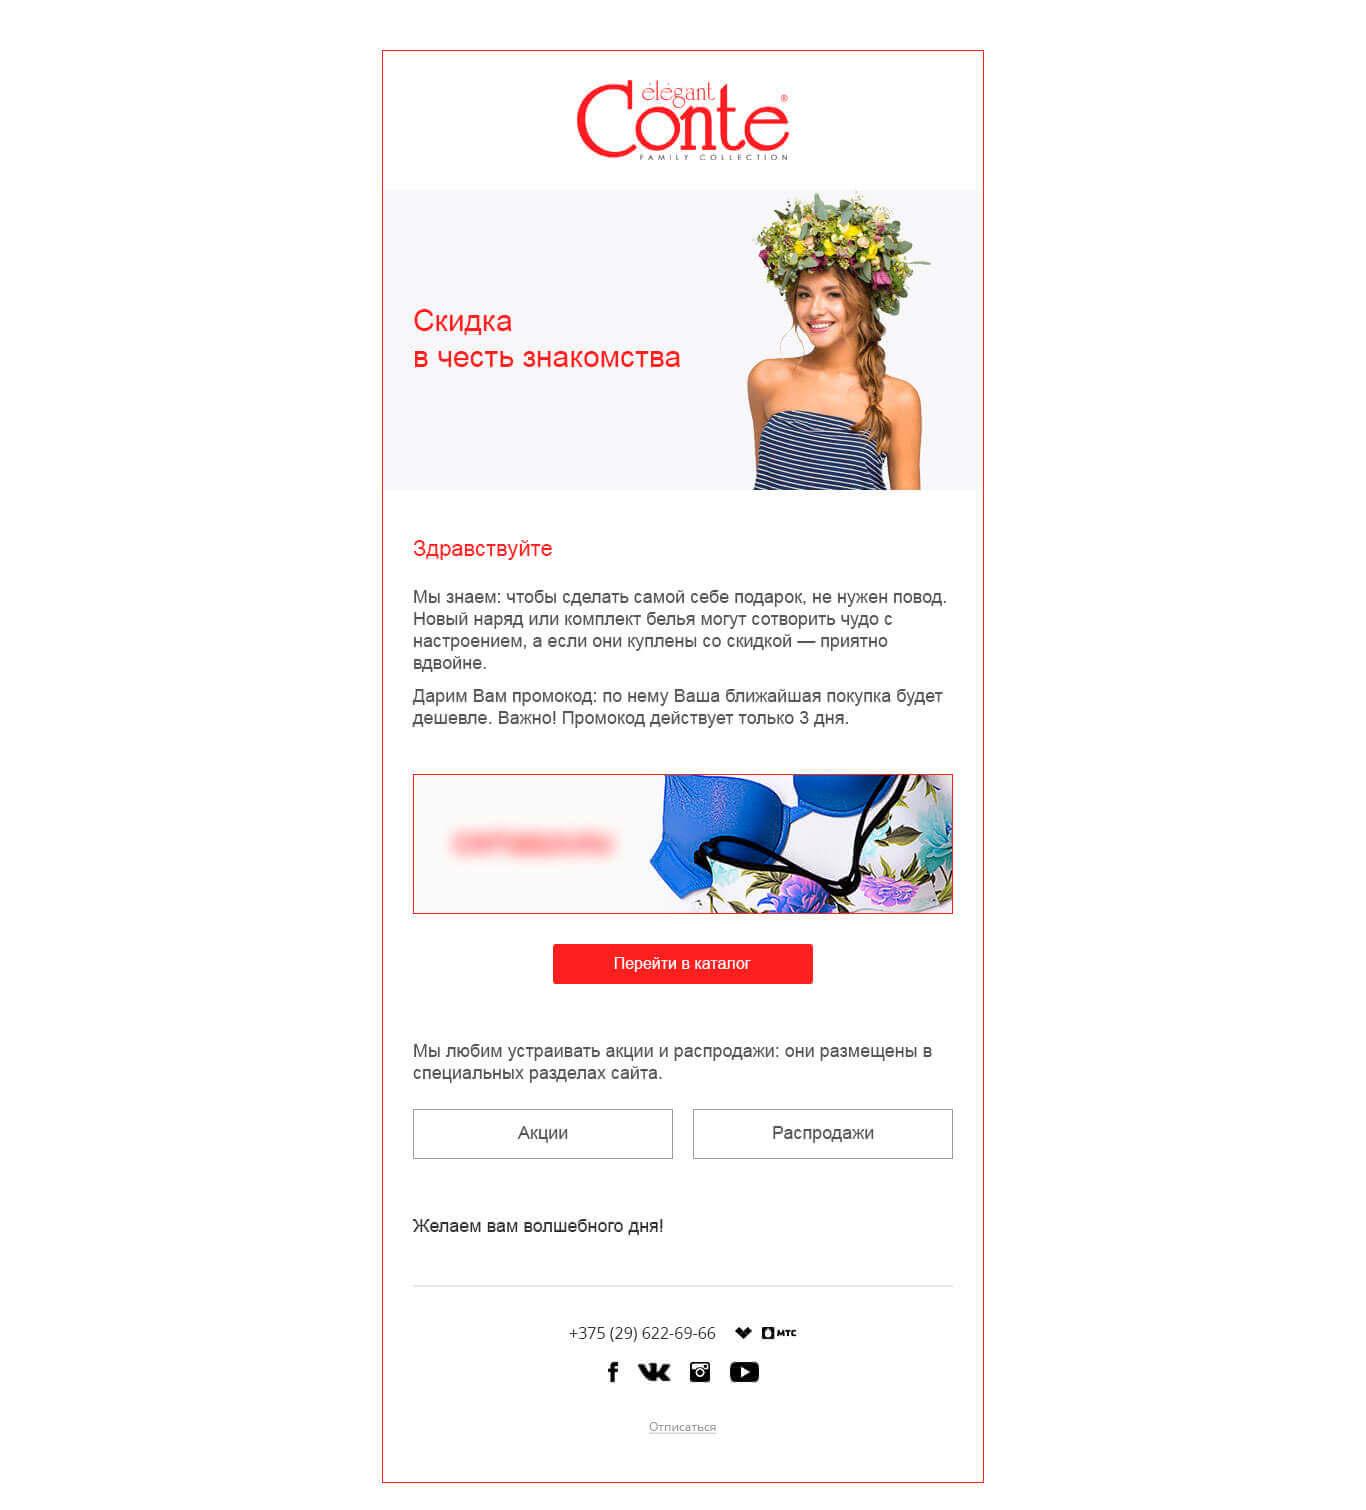 Письмо интернет-магазина Conte